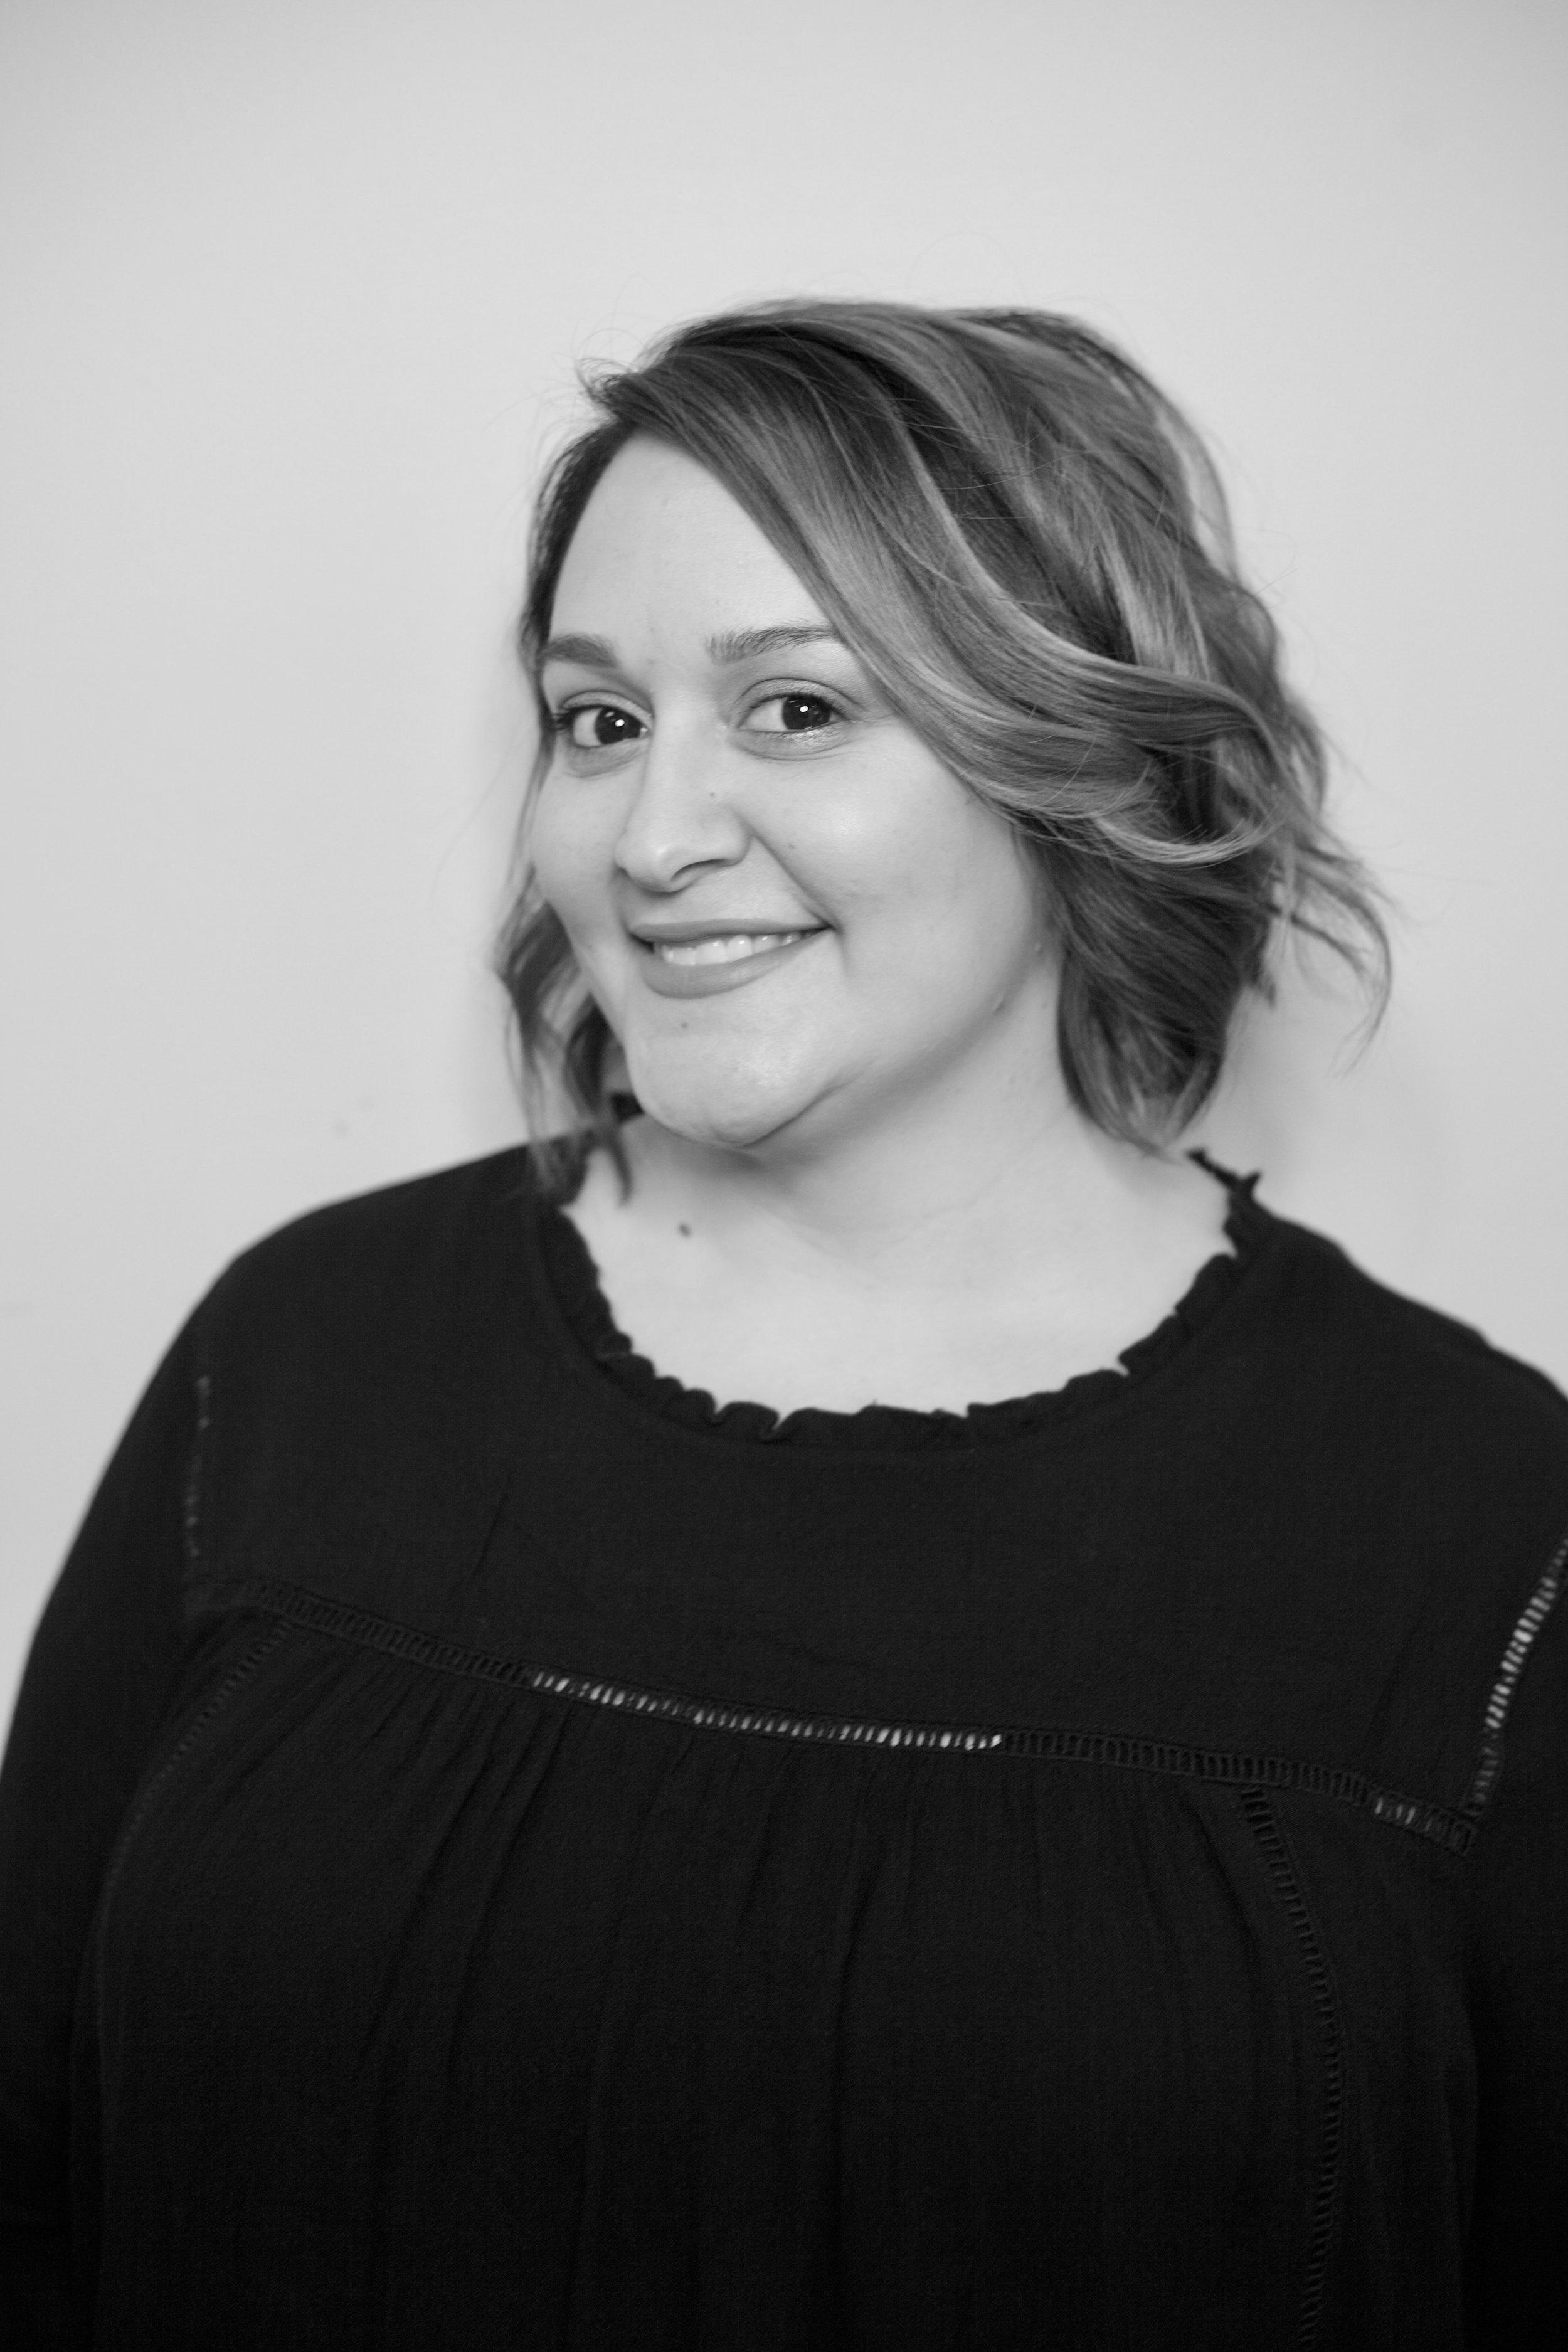 Tara Quick - Esthetician - Makeup Artist - Cupping Specialist@taraquickhair